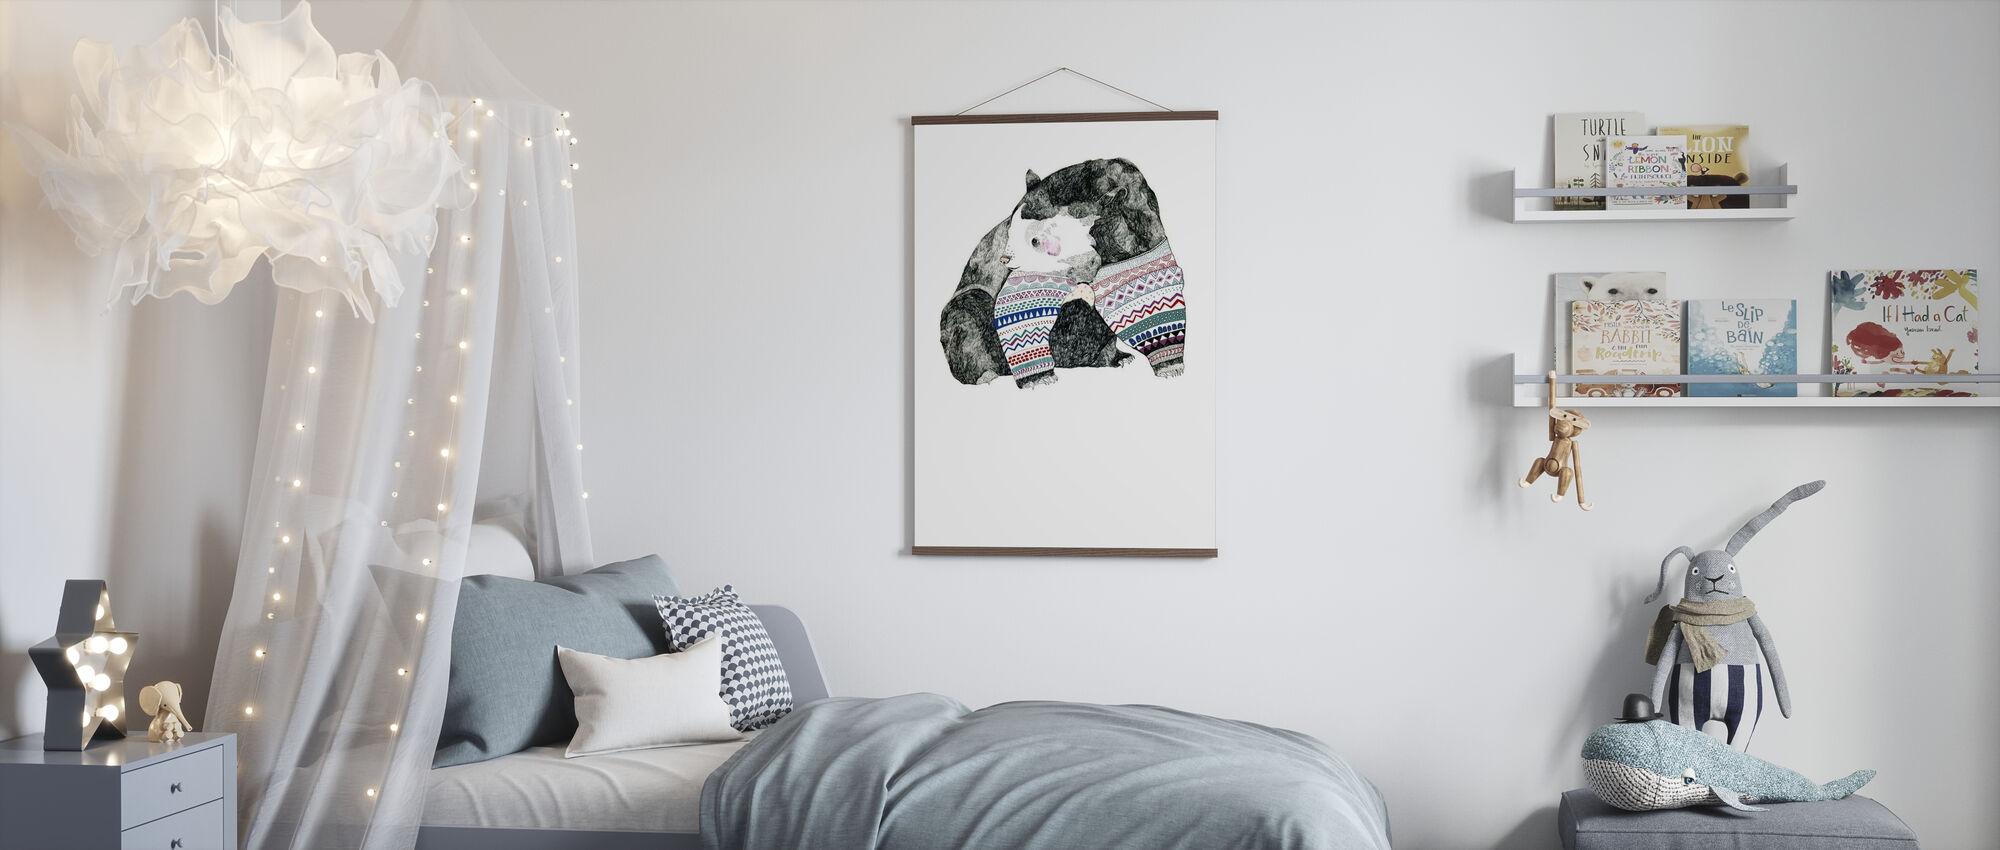 Knitted Bear - Poster - Kids Room